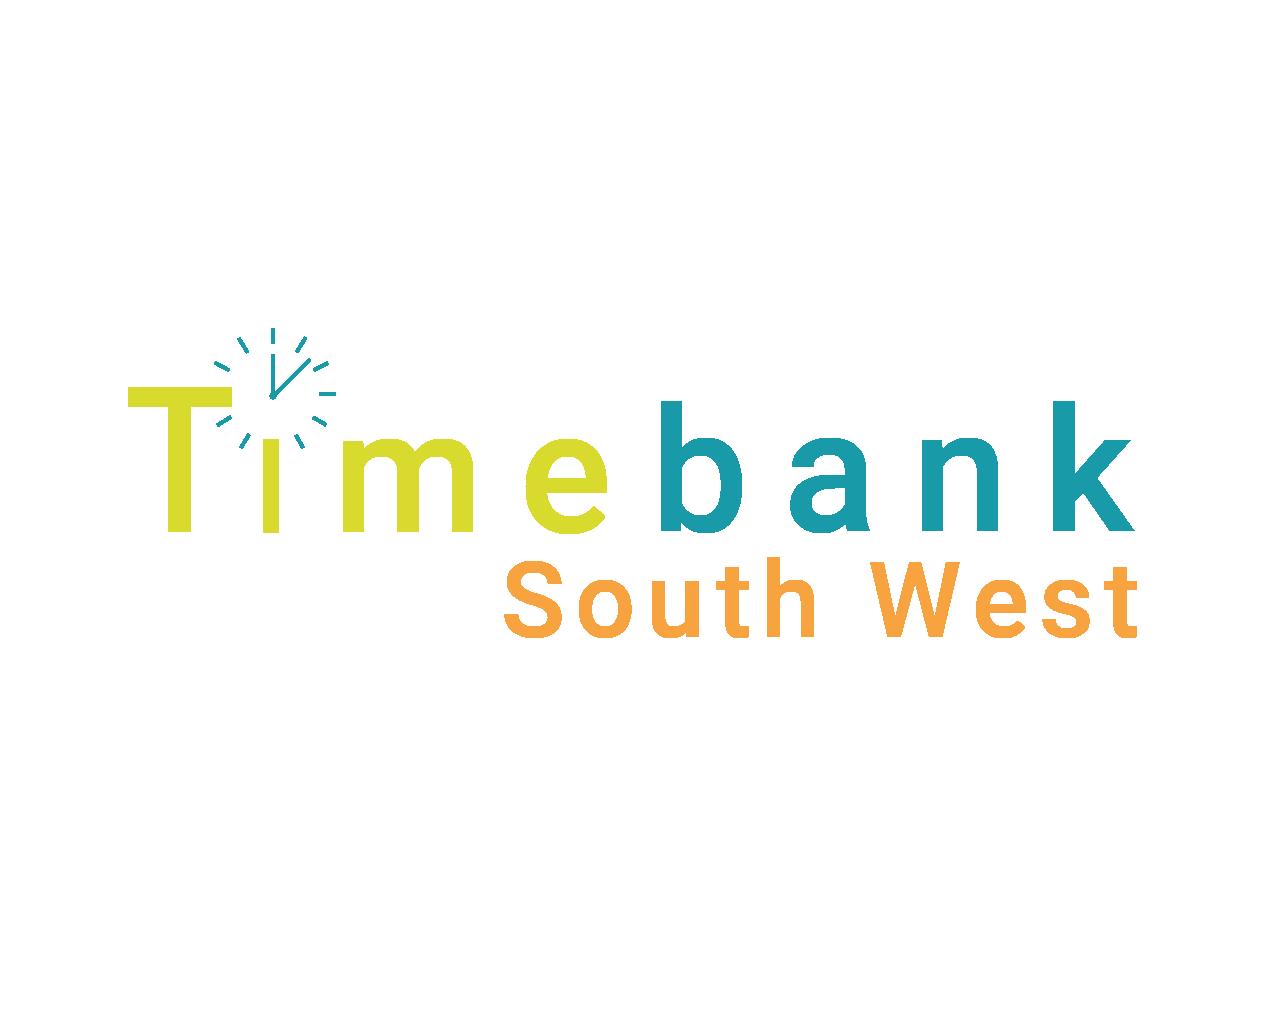 Timebank South West logo